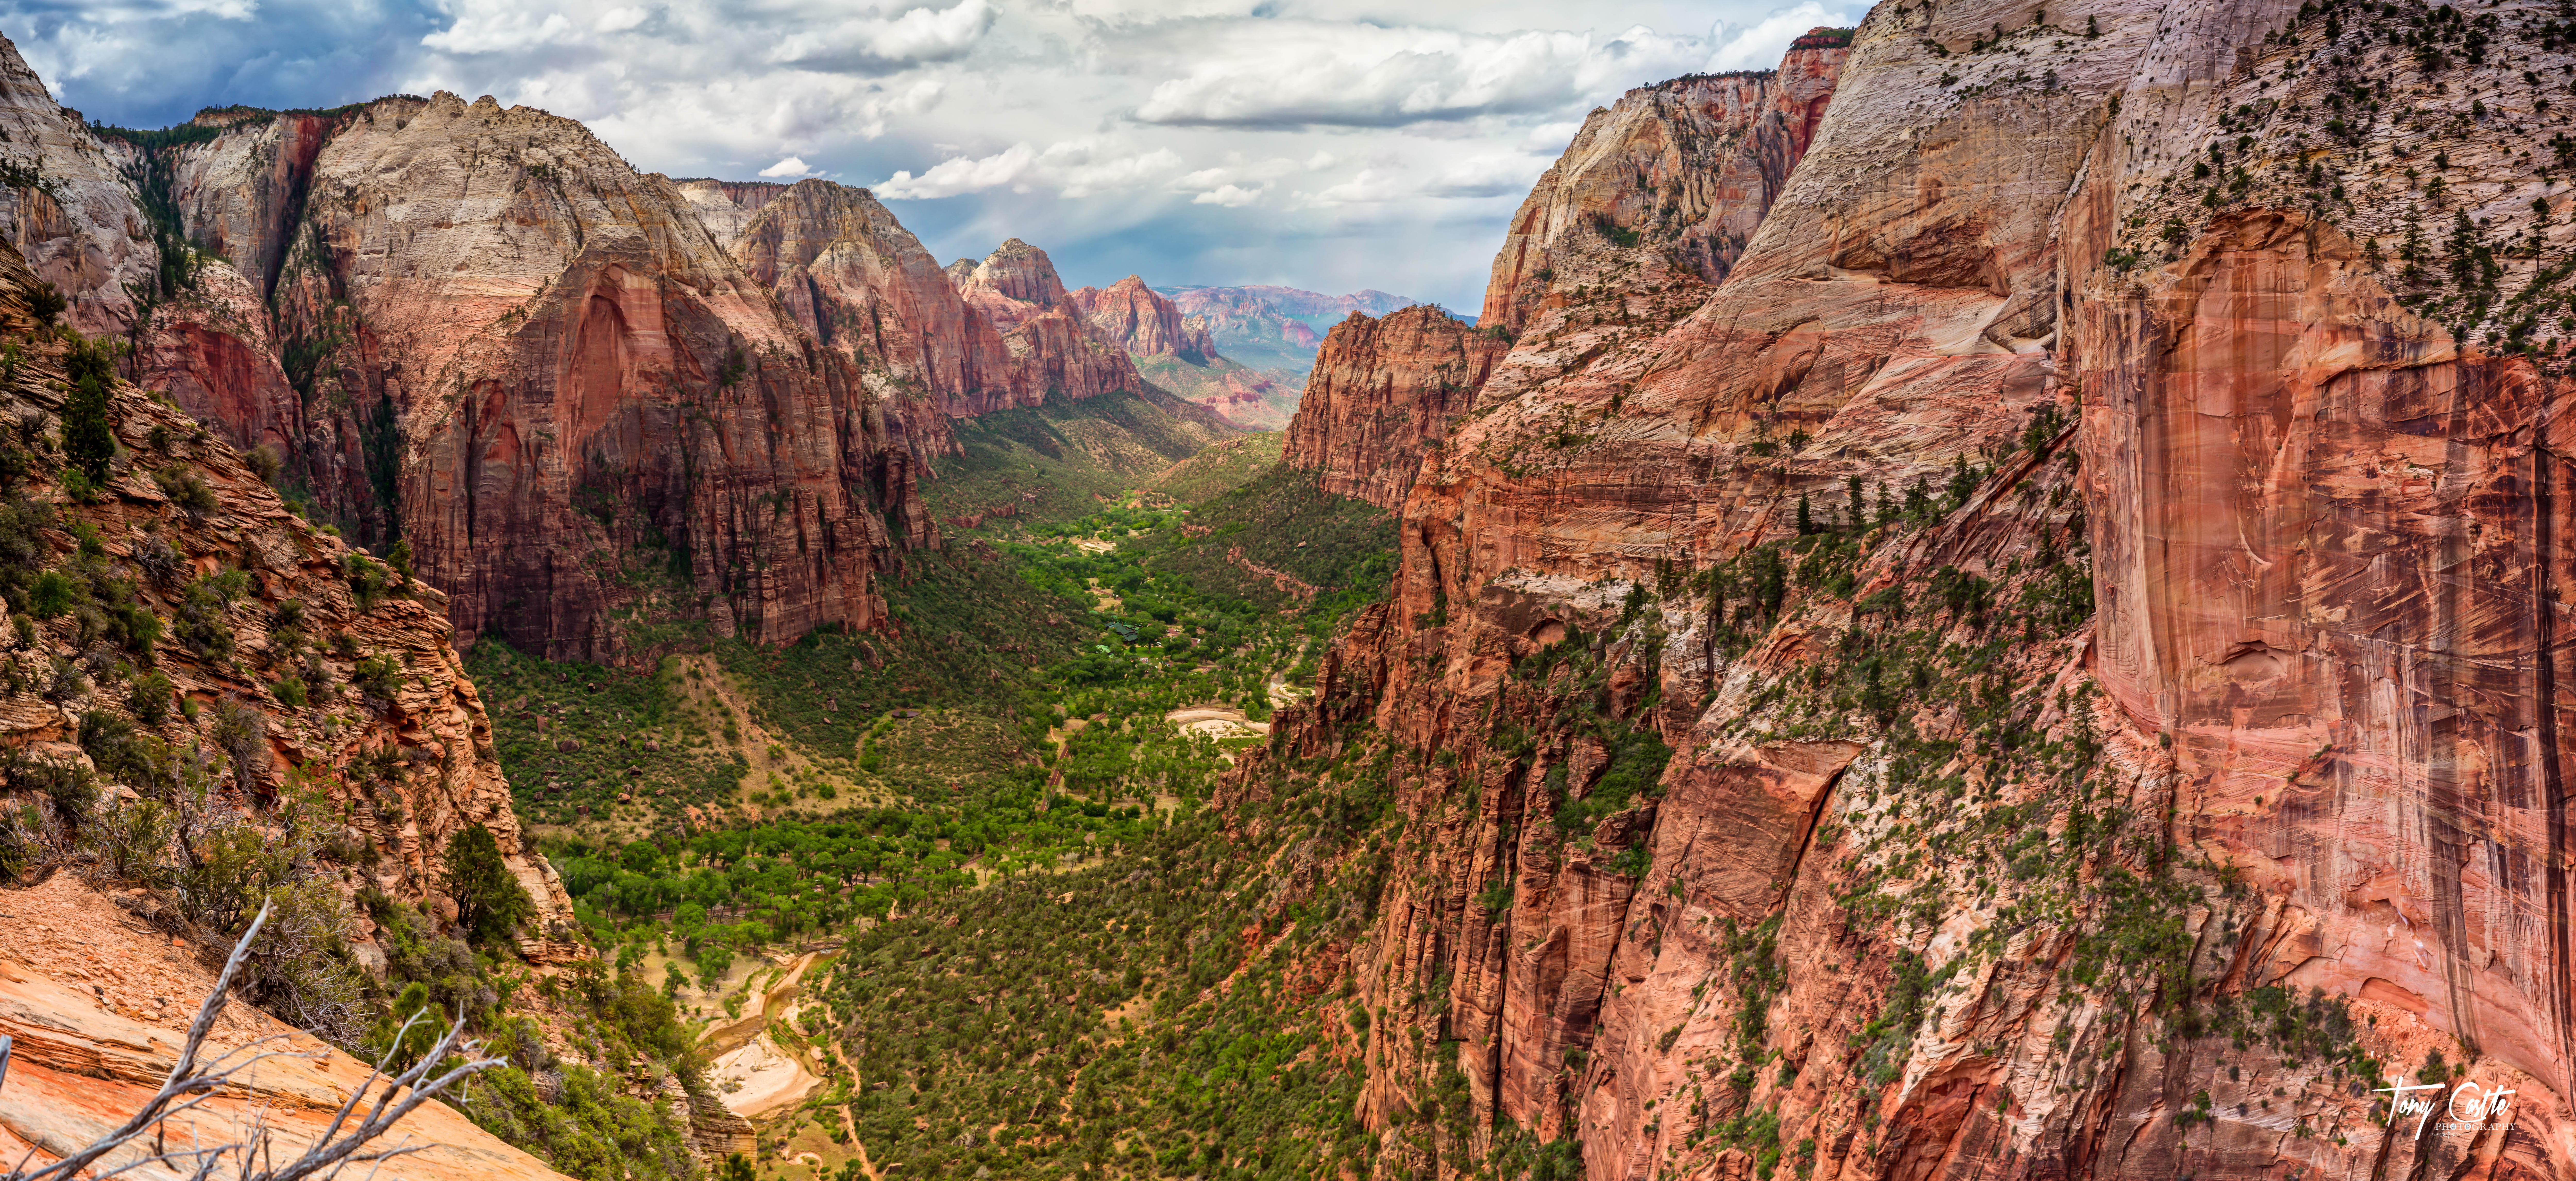 Free Download Zion National Park Utah 11372x5215